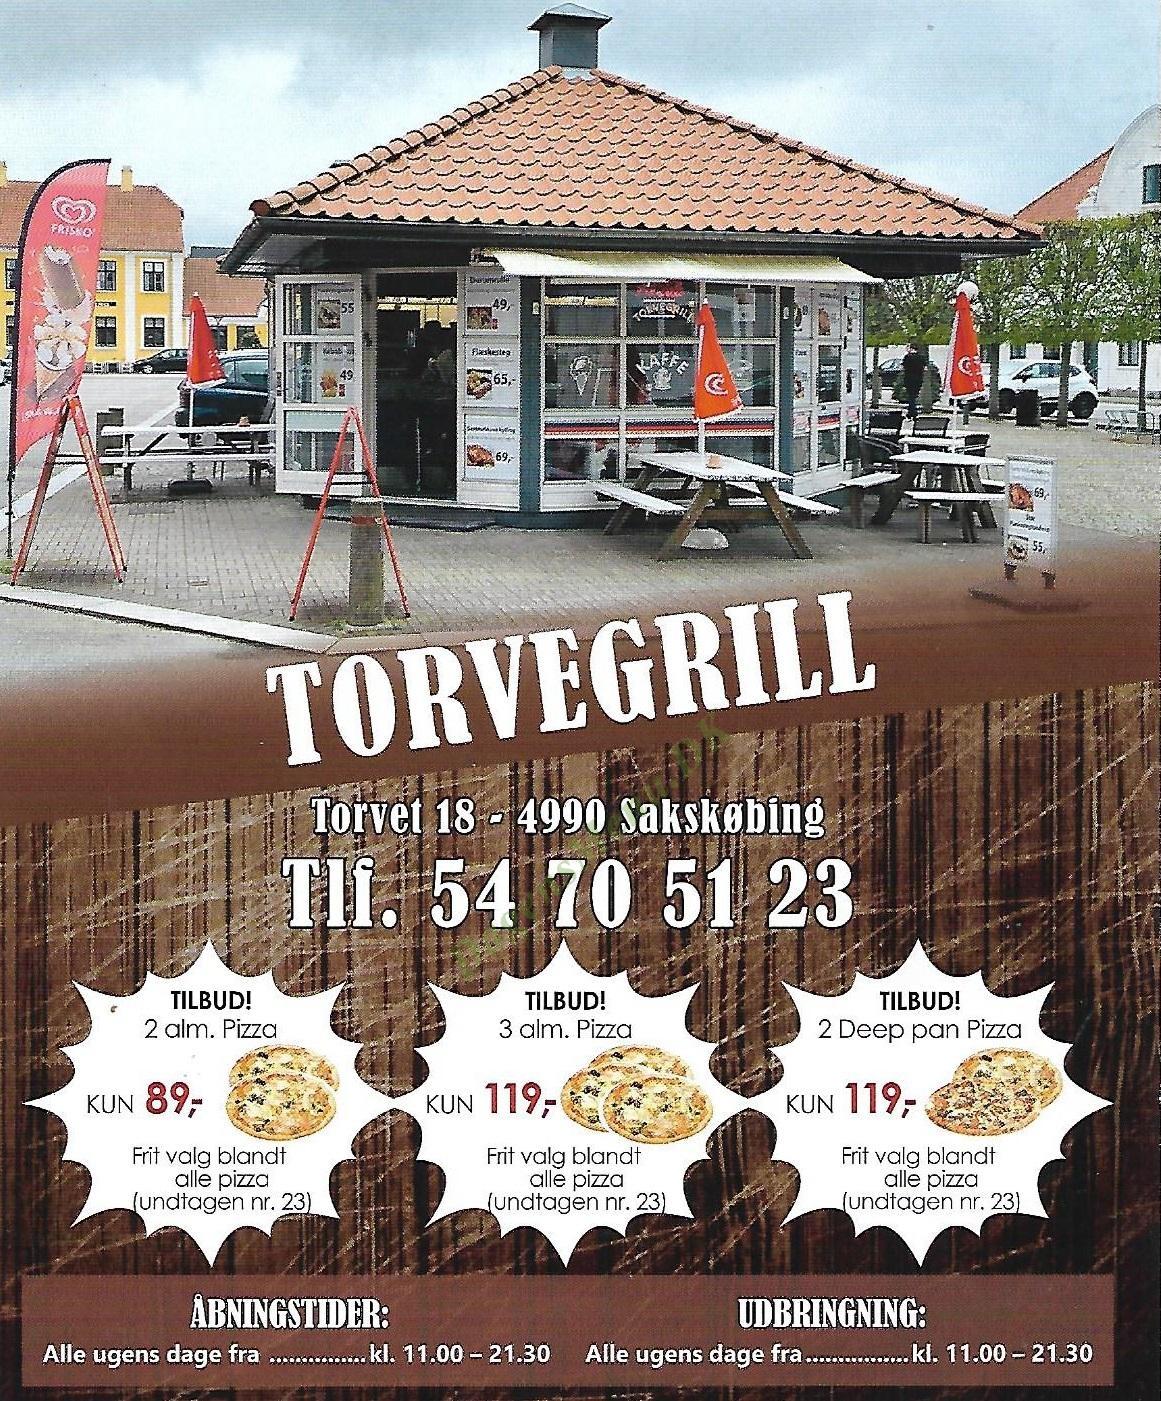 Torvegrill - Menukort